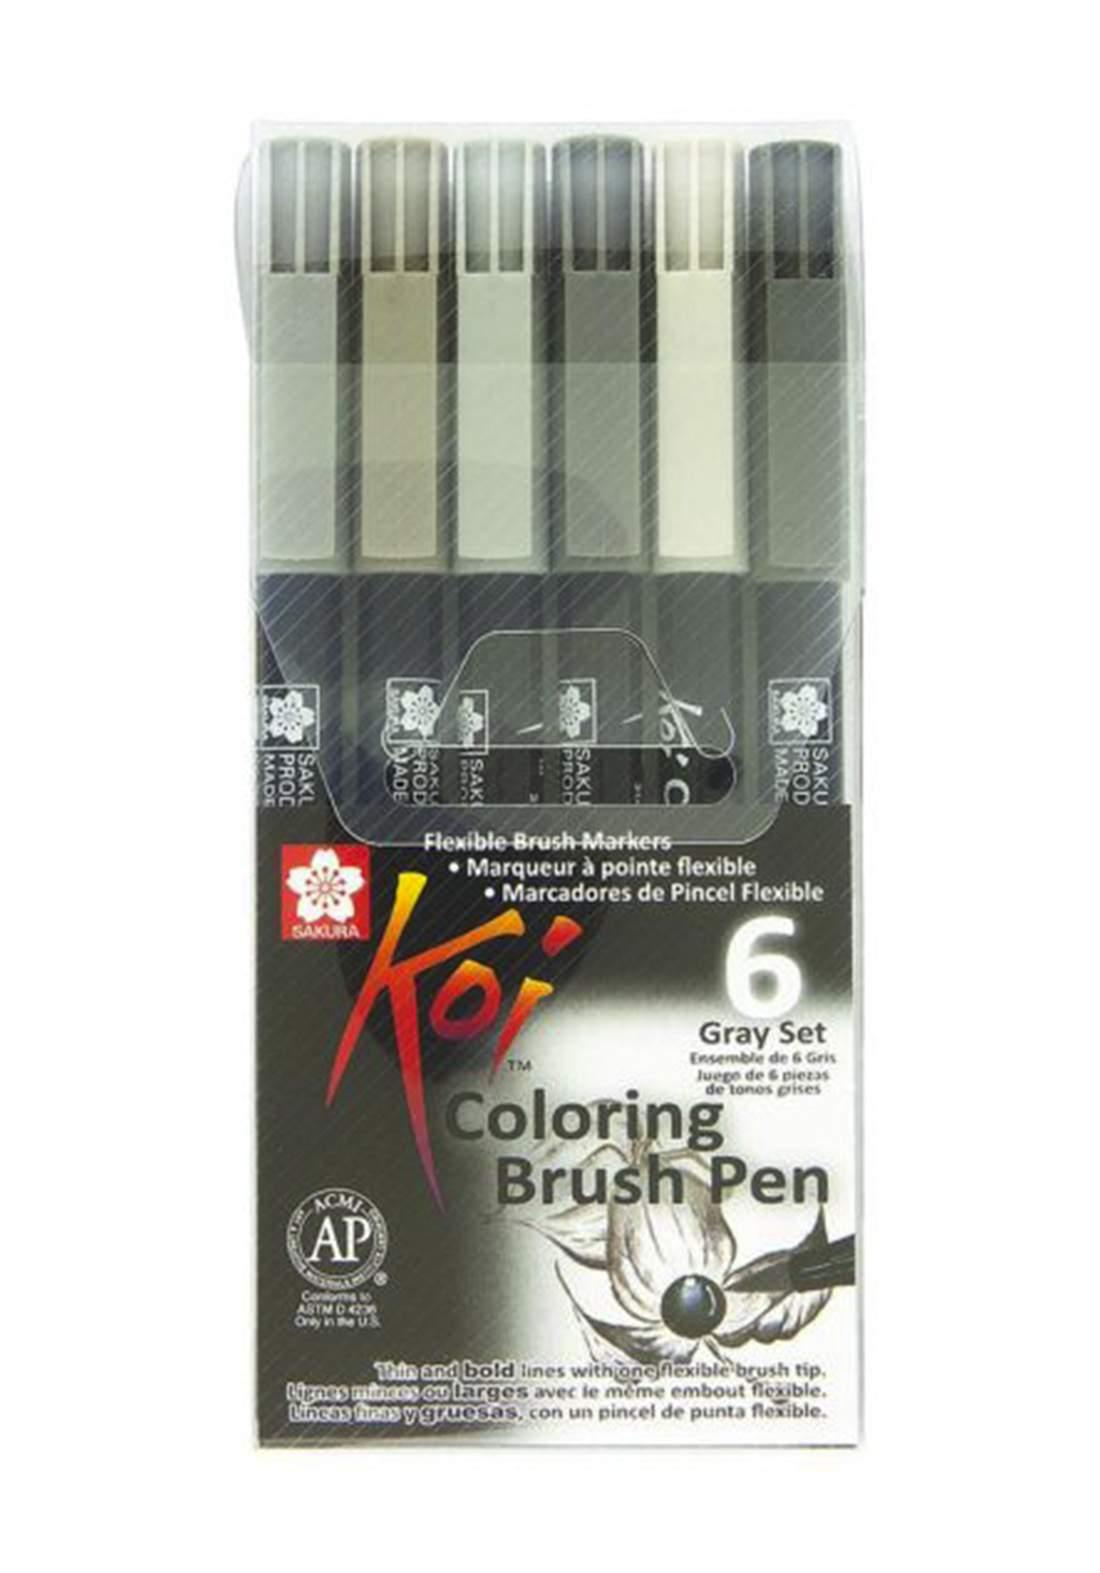 Sakura Koi Coloring Brush Pen 6 - Gray أقلام ماركر 6 الوان رصاصي